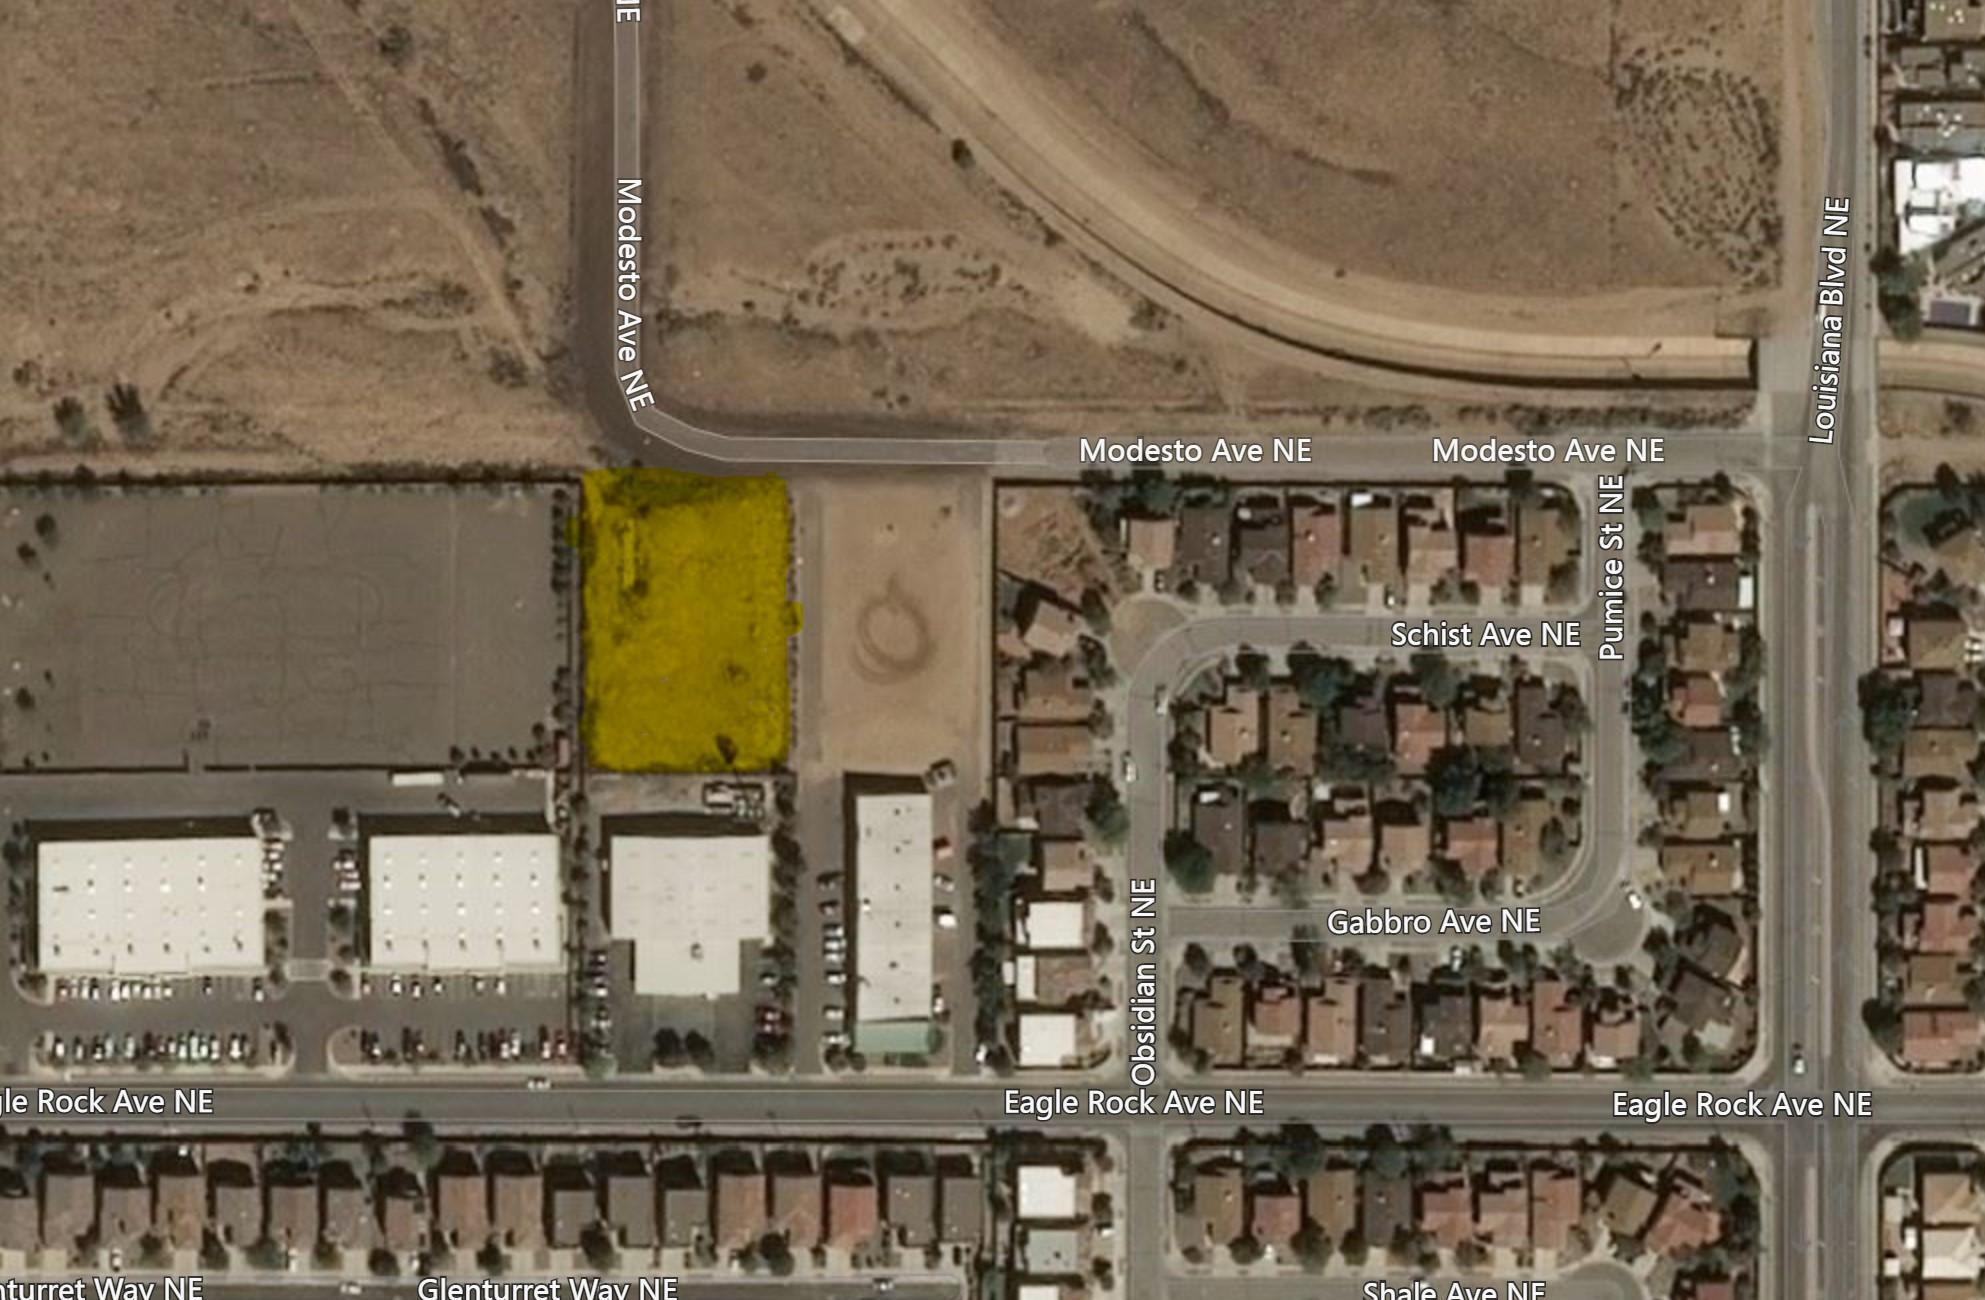 6700 Modesto Avenue NE, Albuquerque, NM 87113 - Albuquerque, NM real estate listing